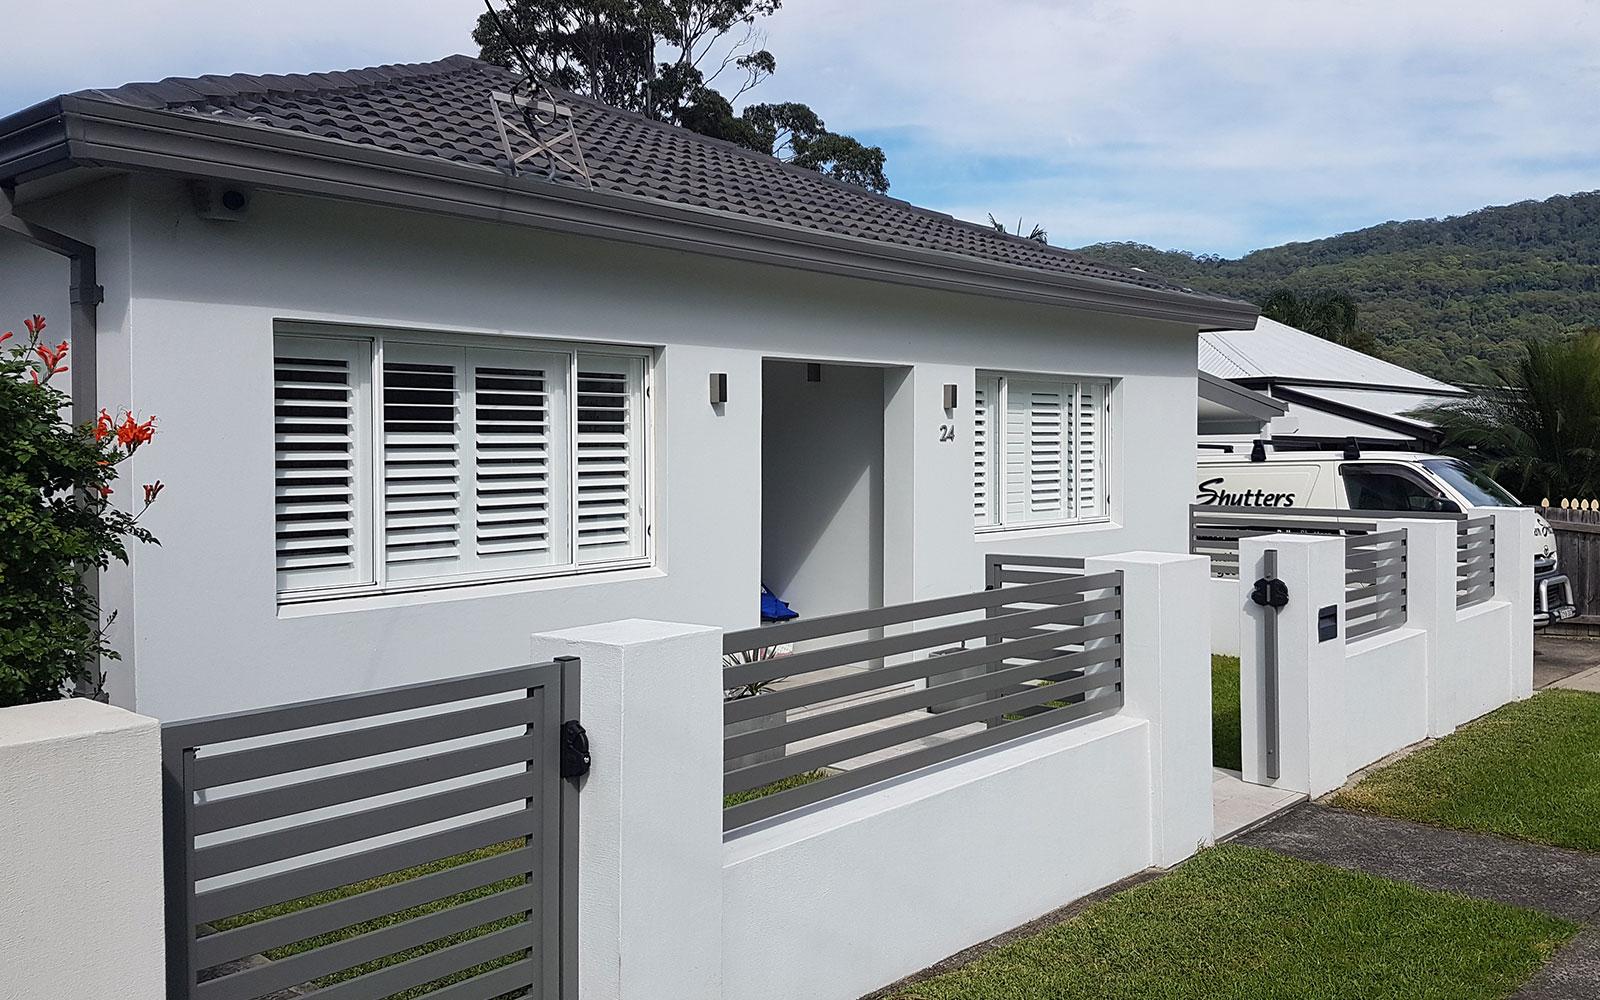 Shutters Wollongong Southern Shutters Online Illawarra Wollongong Shellharbour